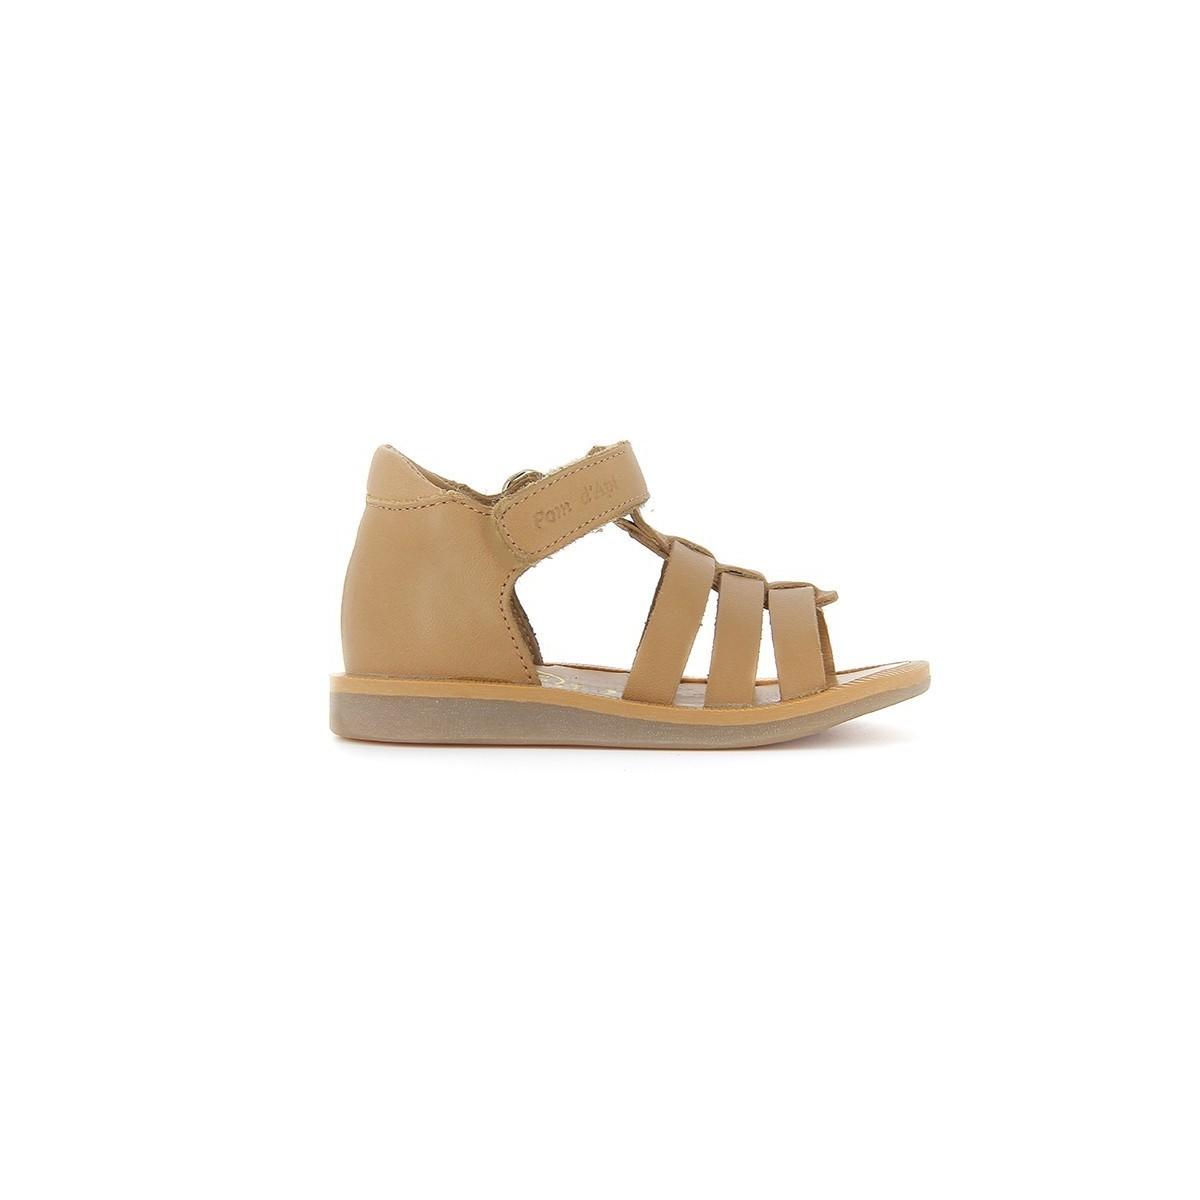 Sandale Poppy haute velcro cuir camel